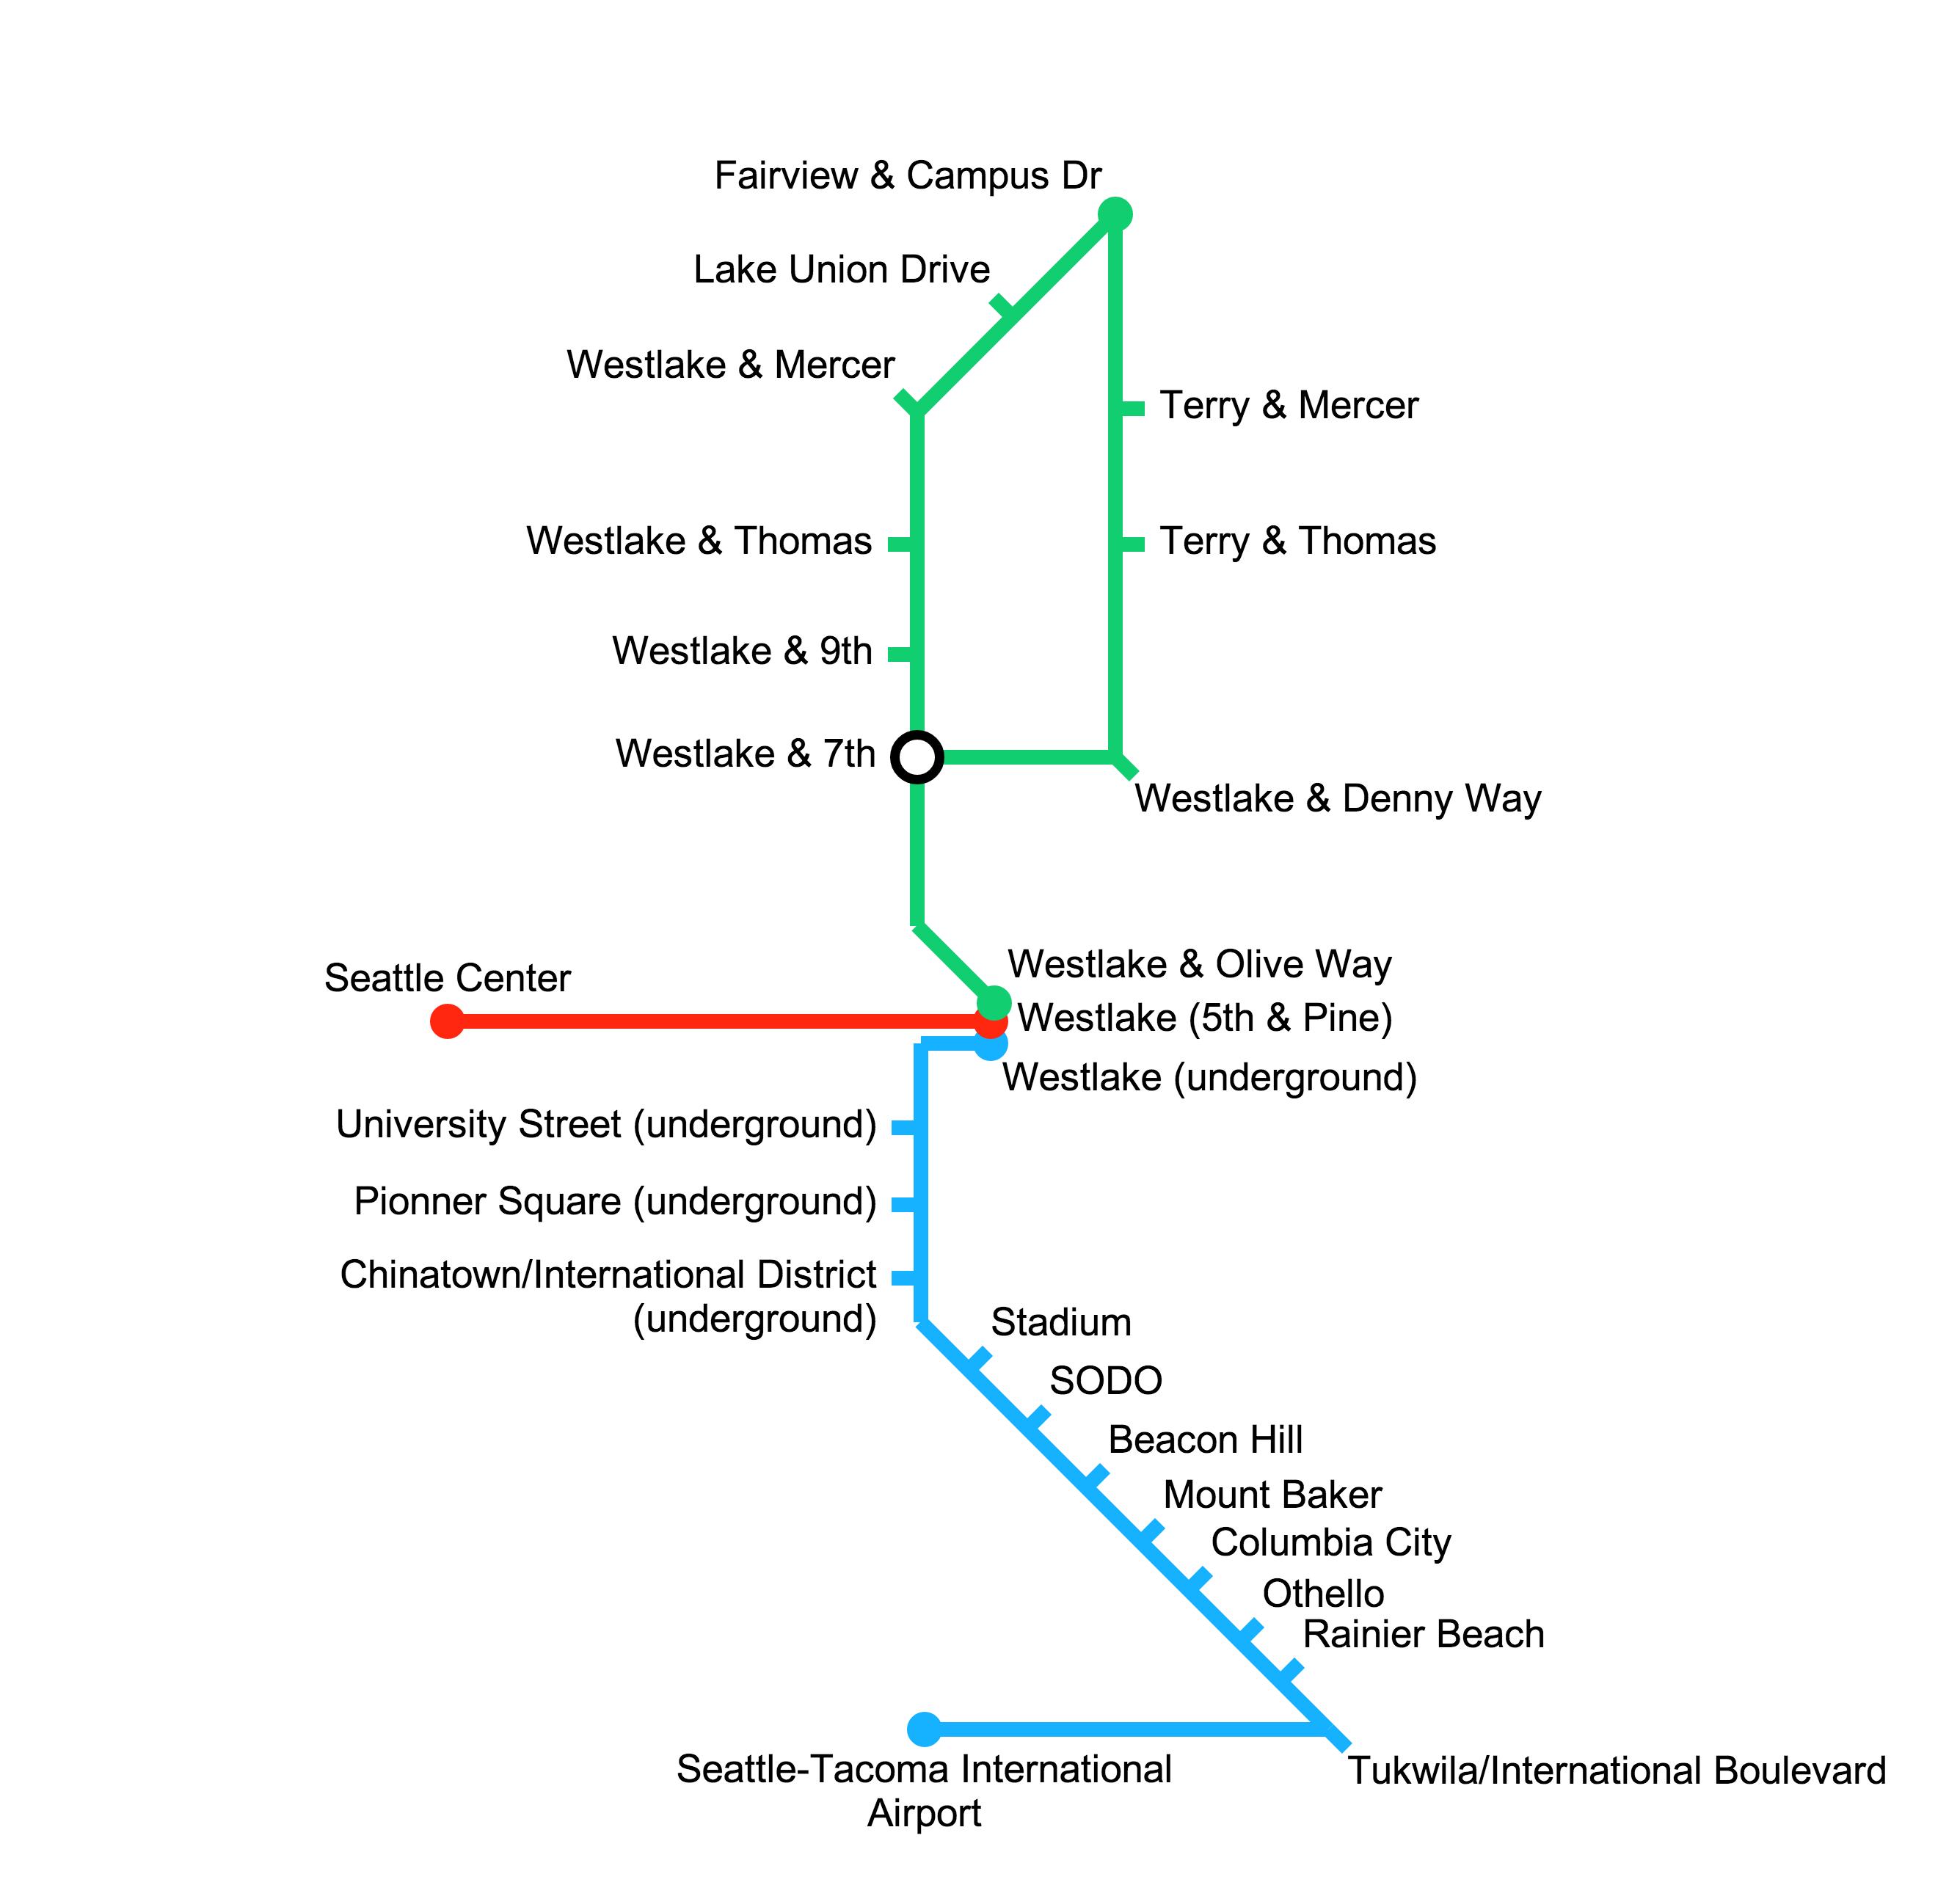 fileseattle train mappng. fileseattle train mappng  wikimedia commons